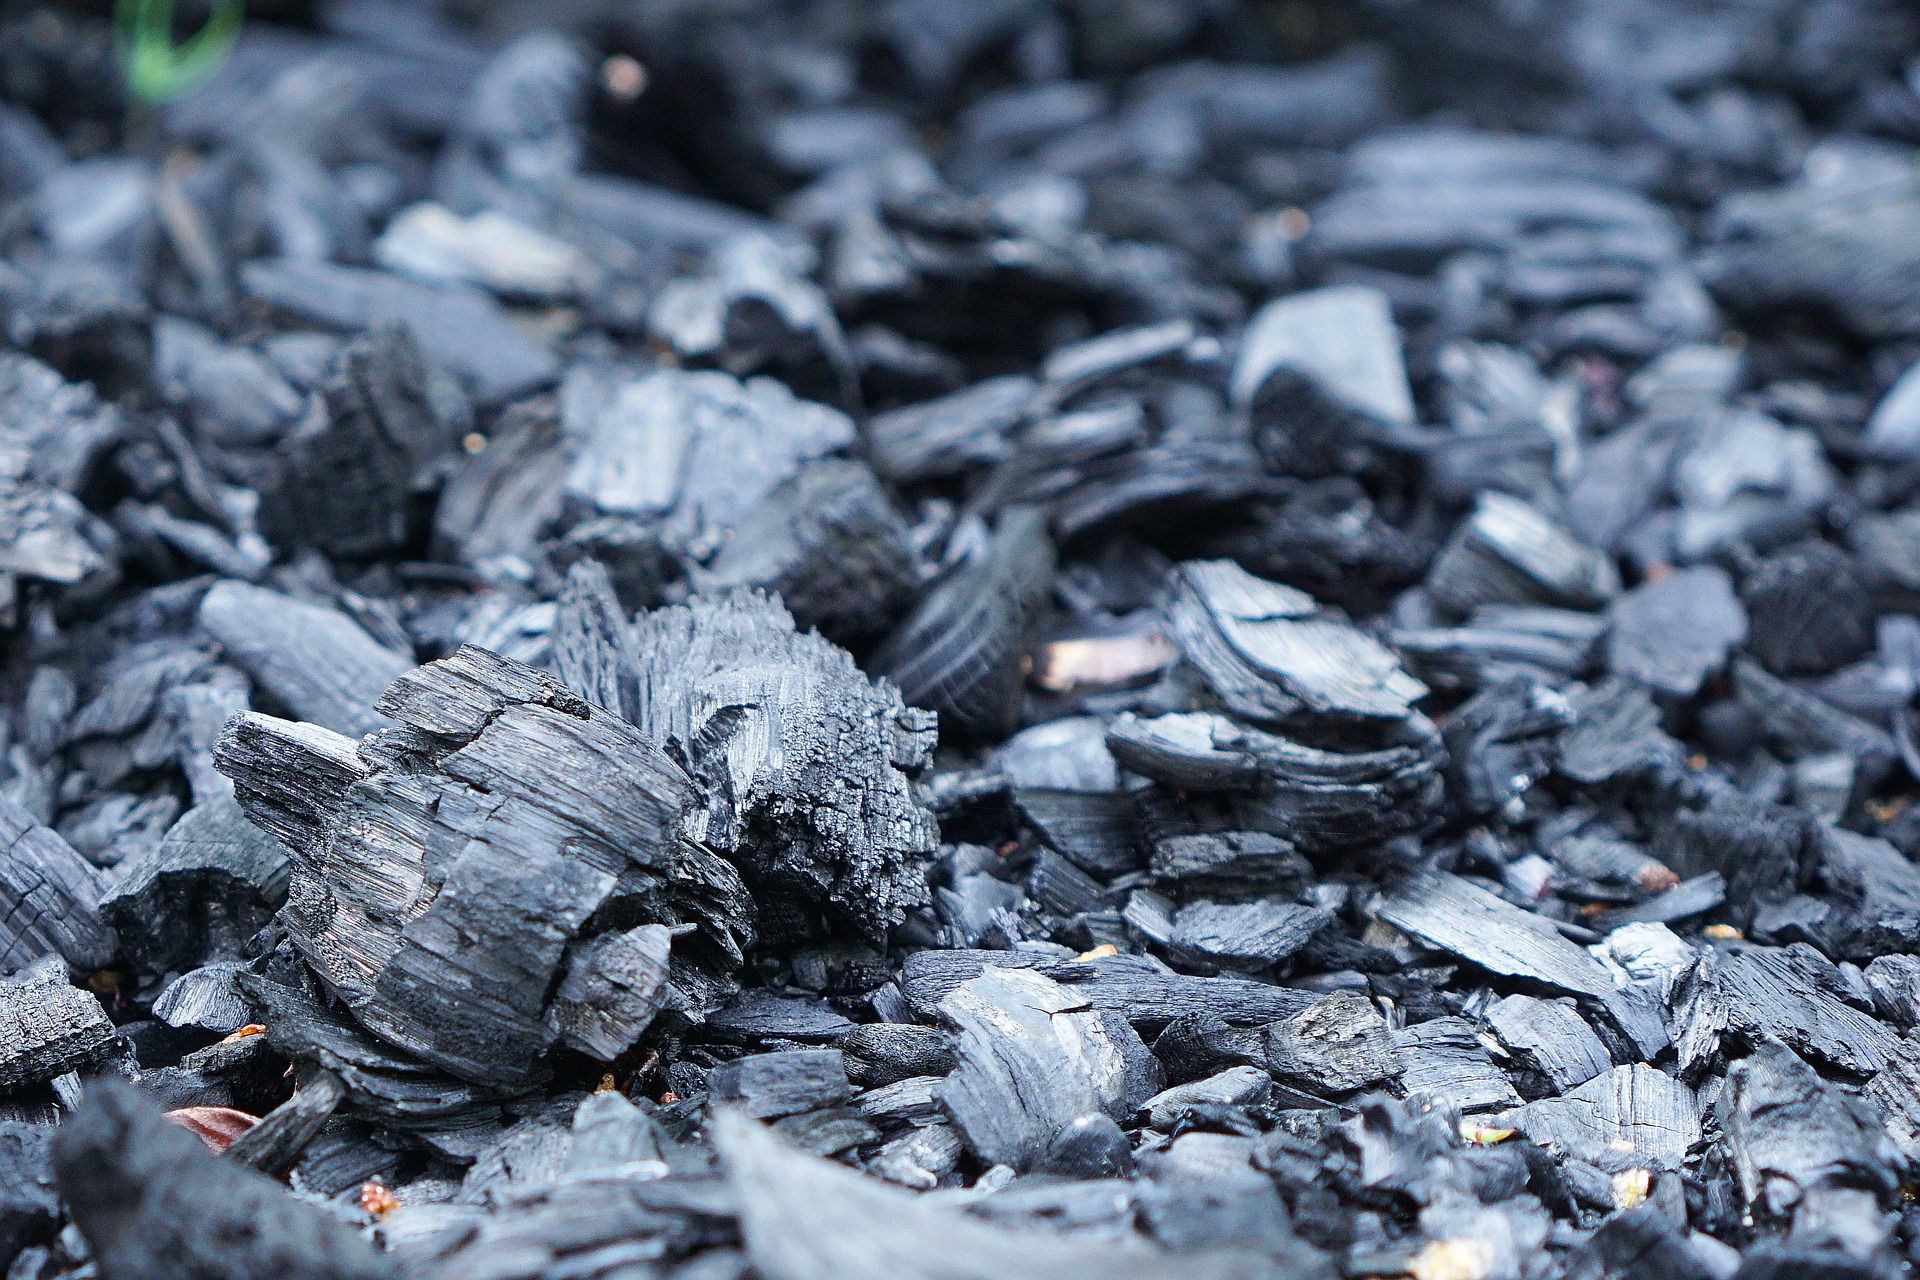 άνθρακα άνθρακα άνθρακα